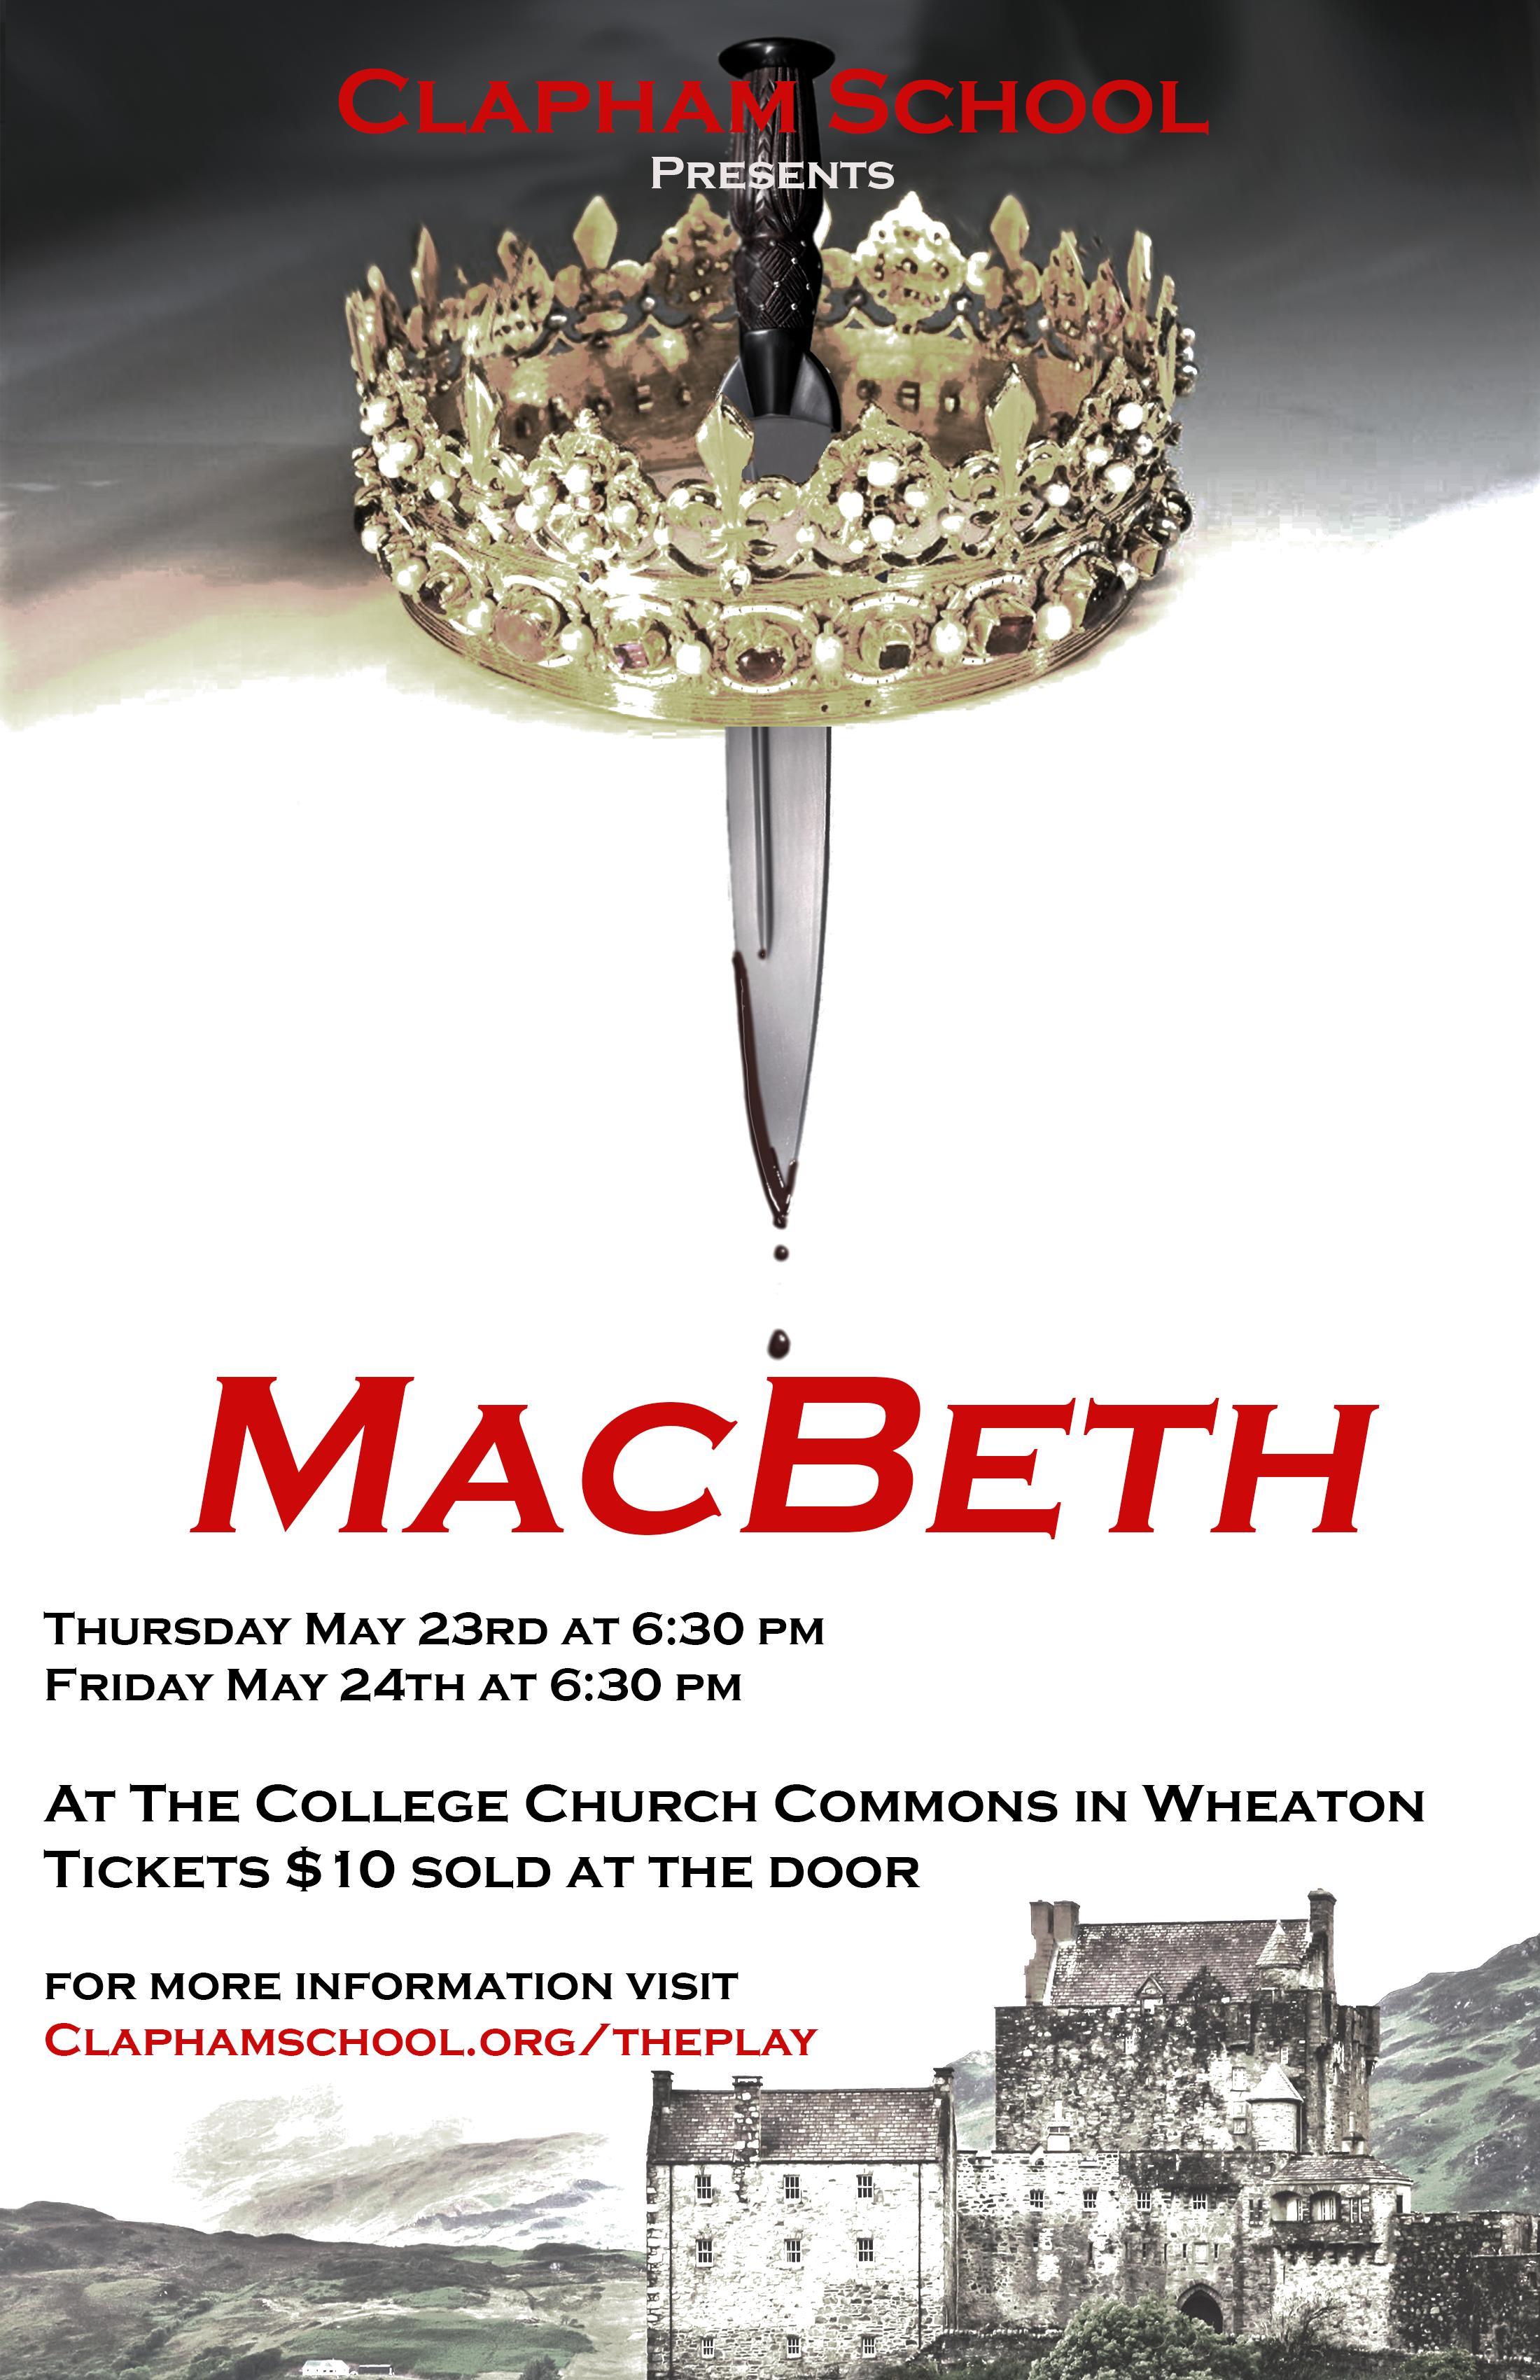 Blog - Clapham School | Shakespeare